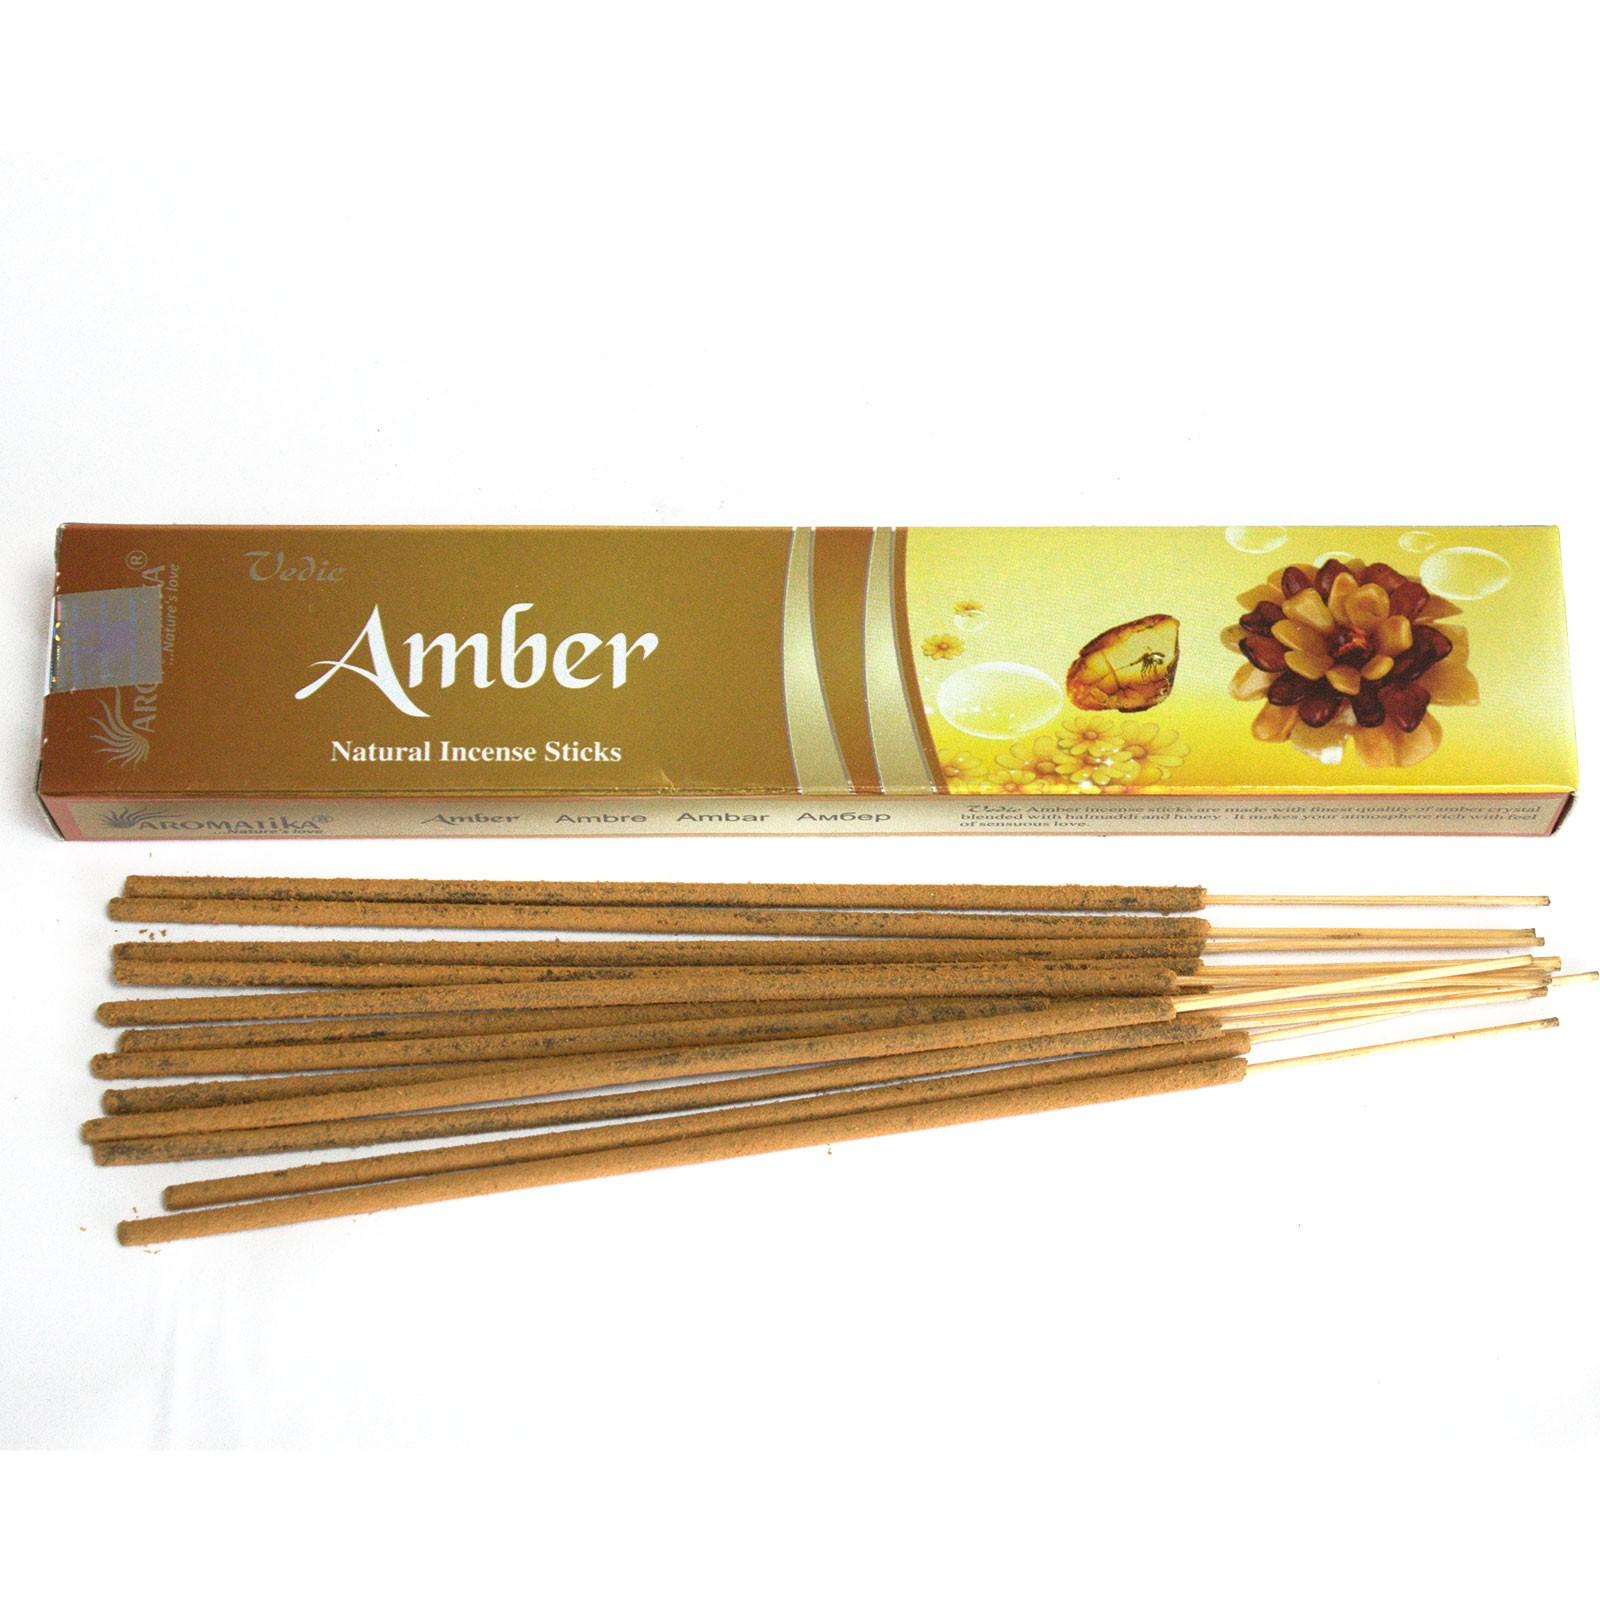 Vedic Incense Sticks Amber